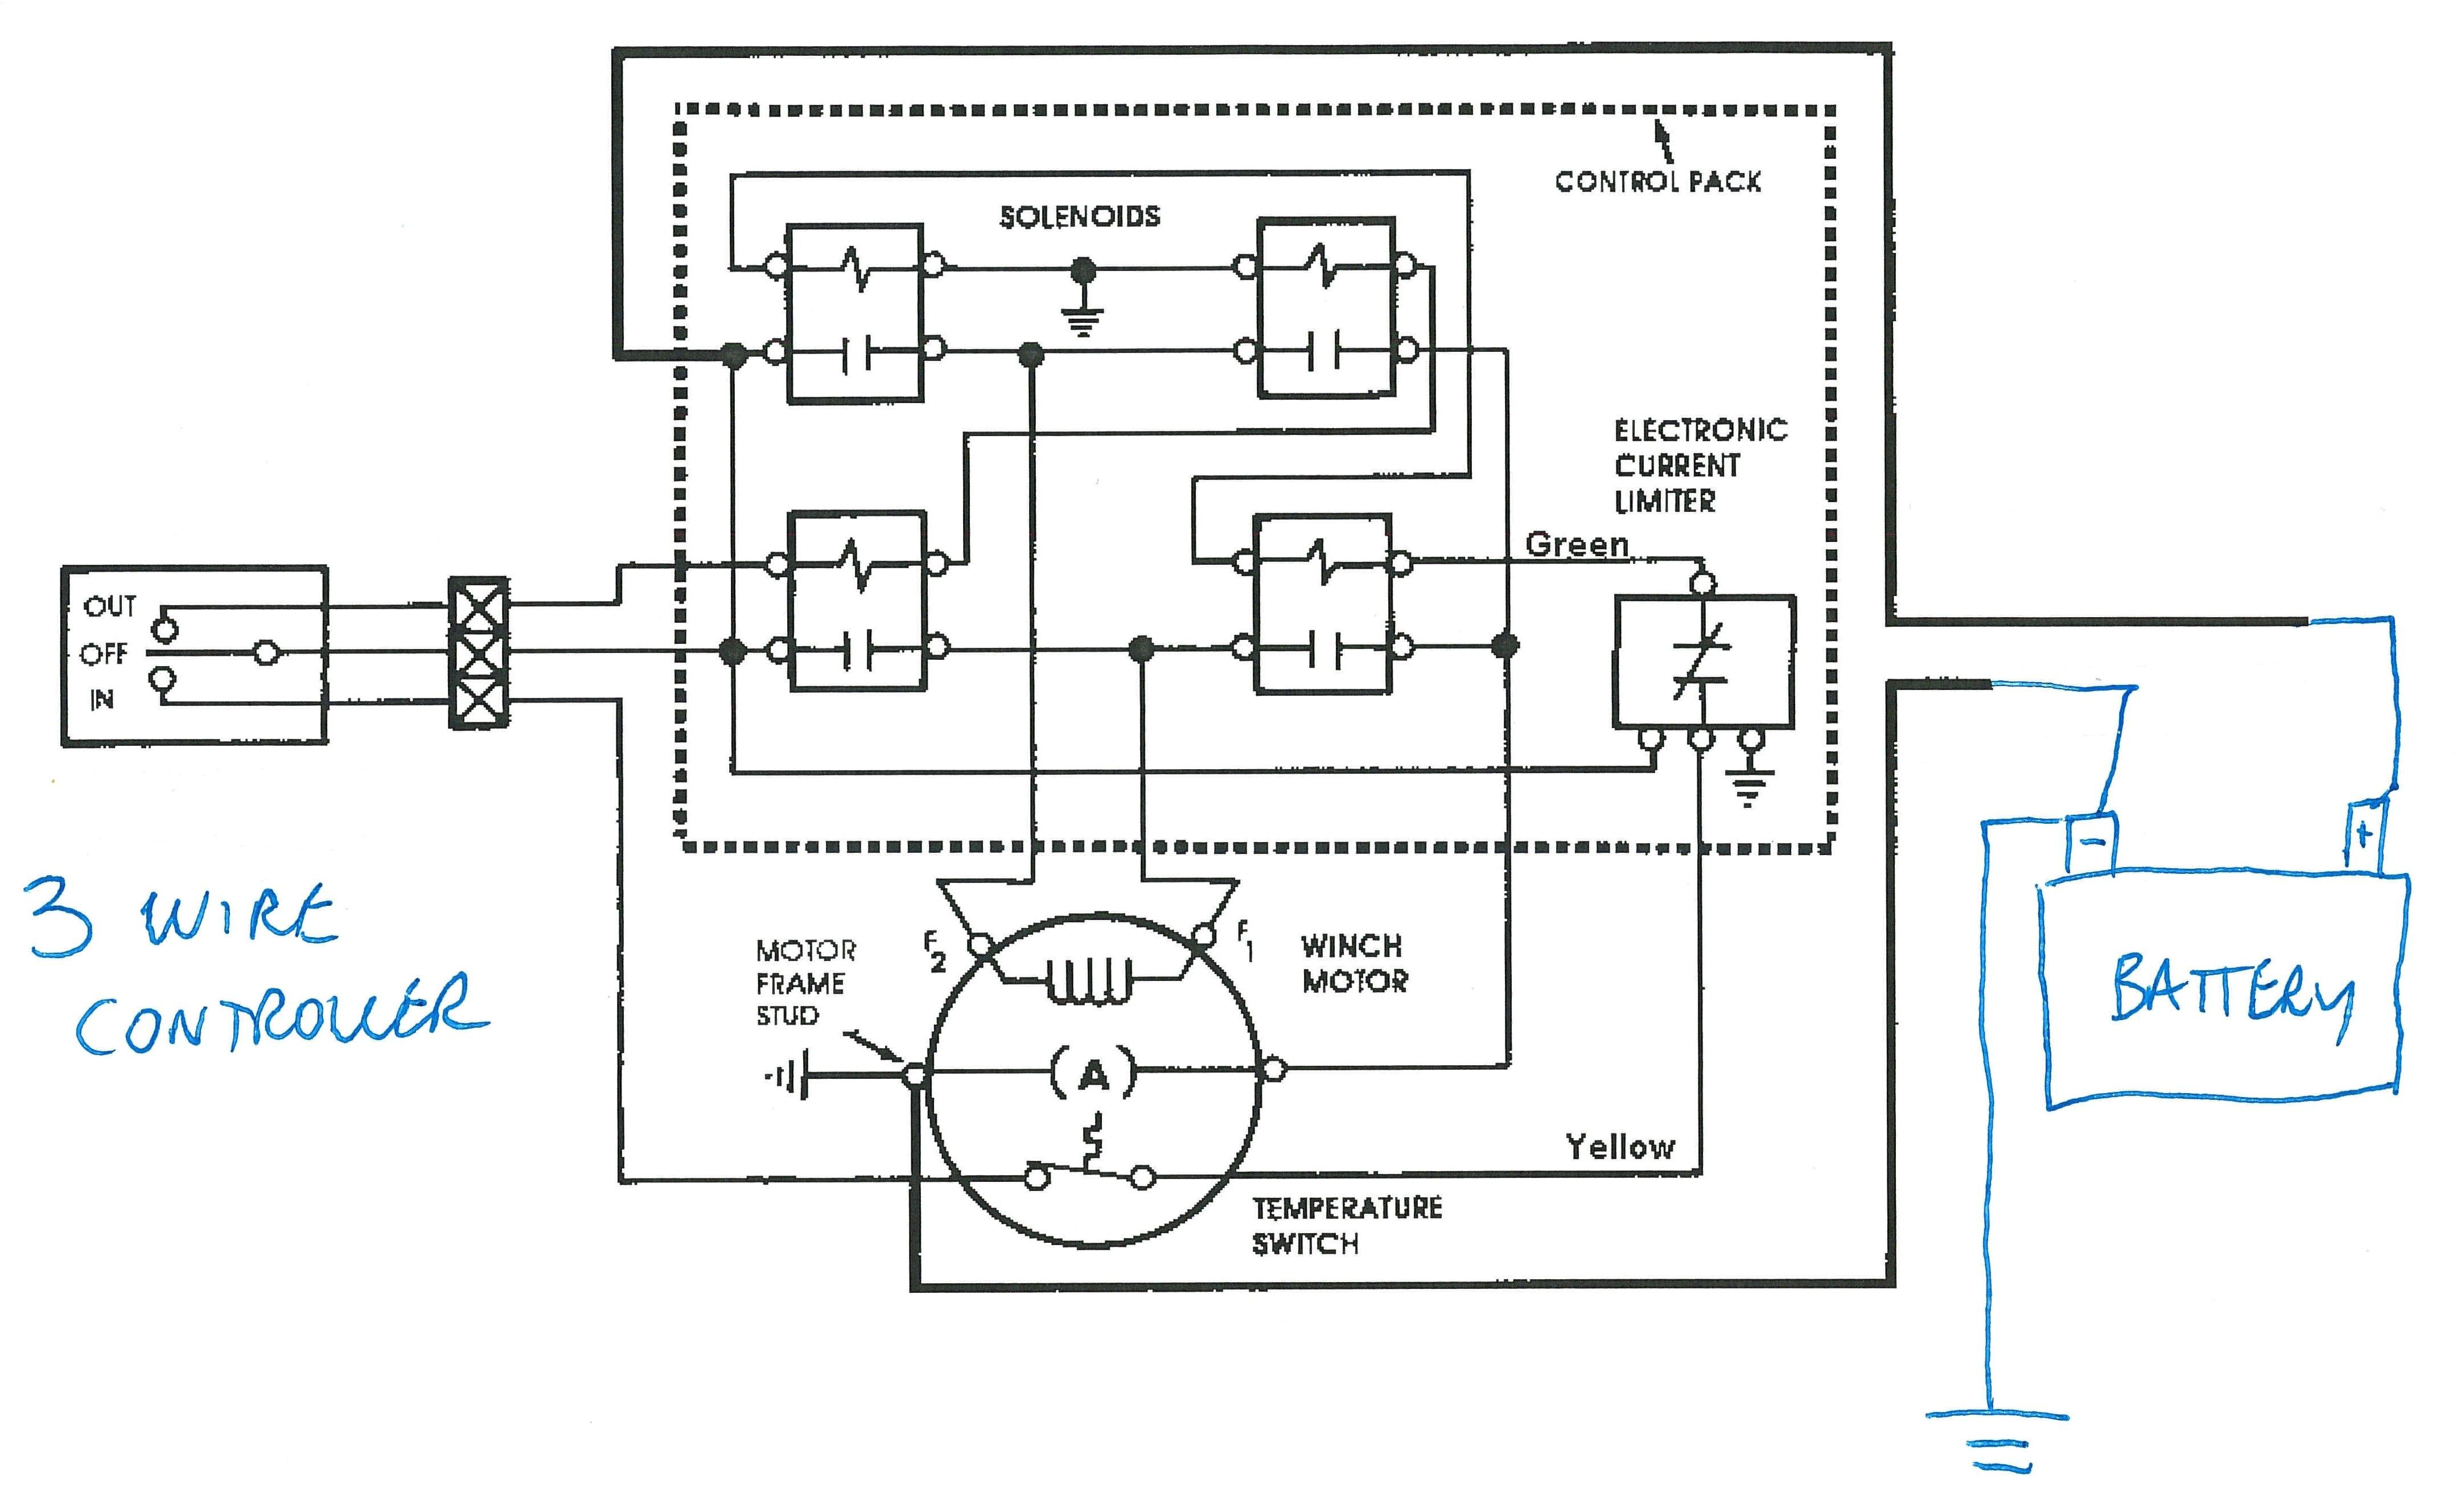 warn winch m8000 wiring diagram tool parts catalog instructions printable free chart pdf jpg